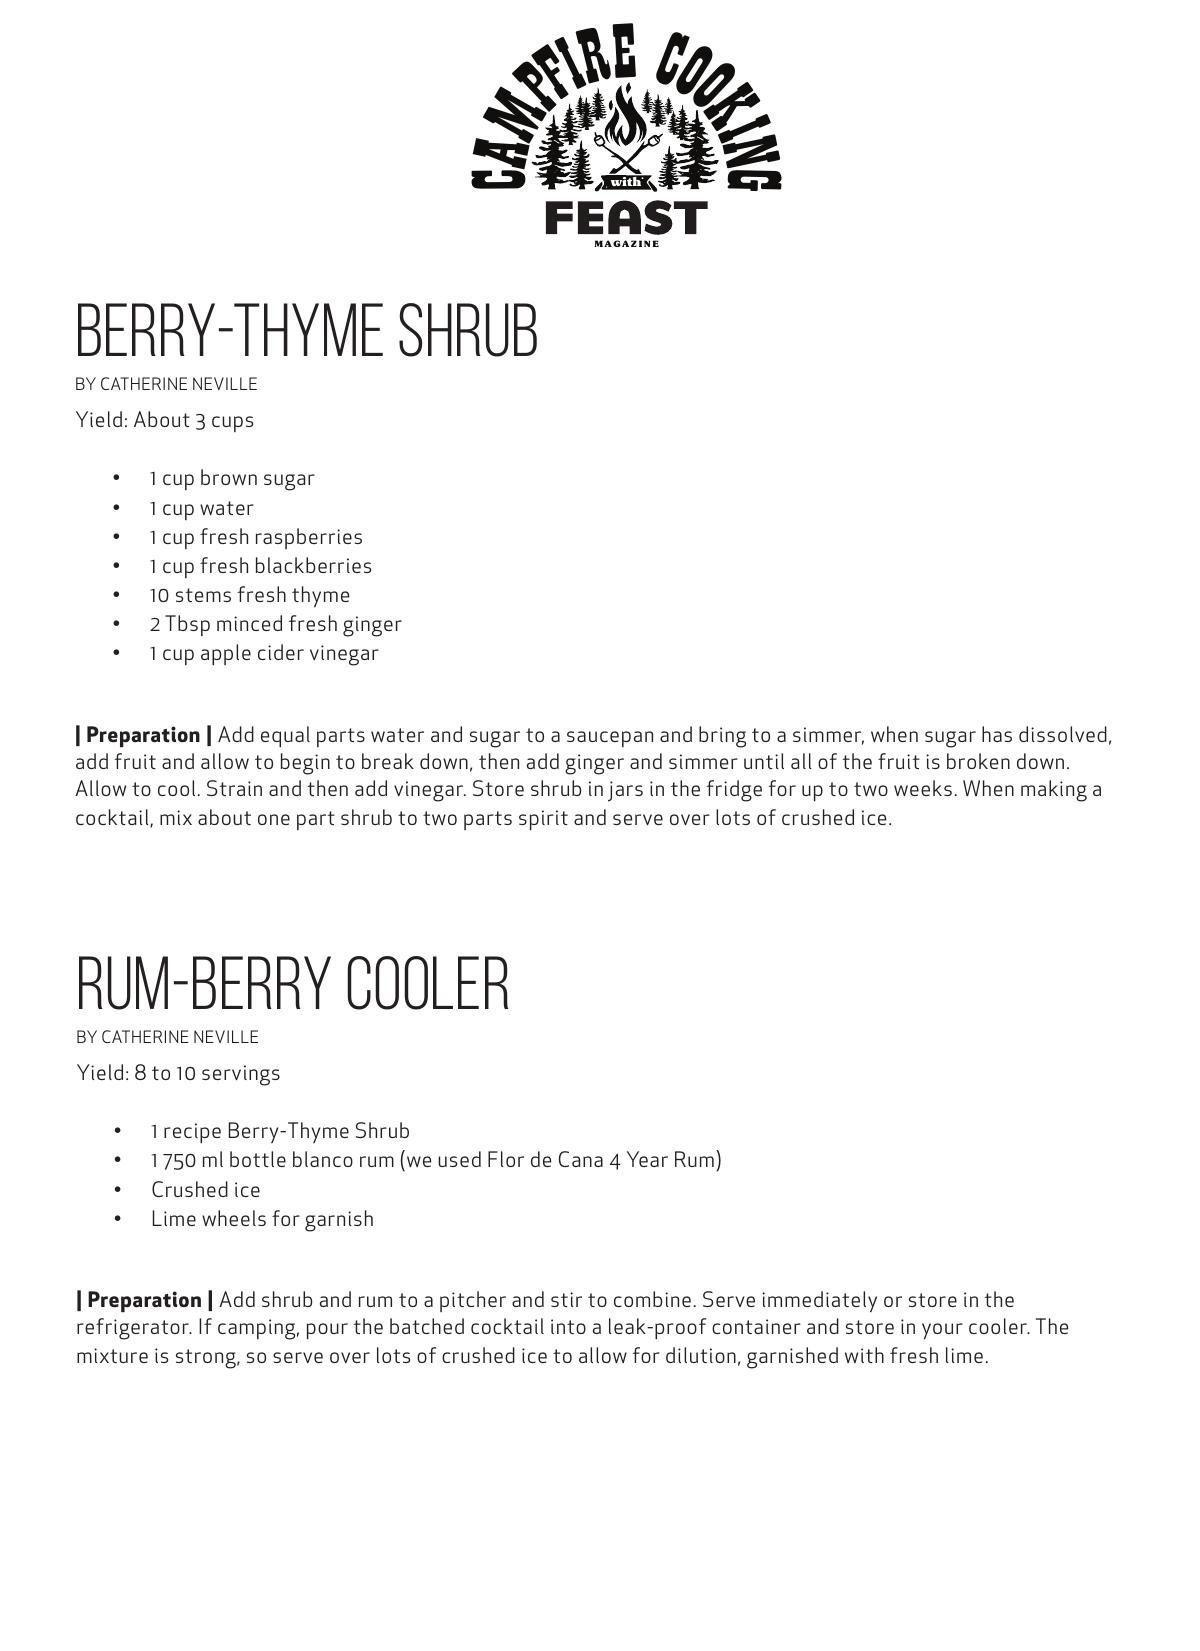 Print your copy: Batched Cocktails!